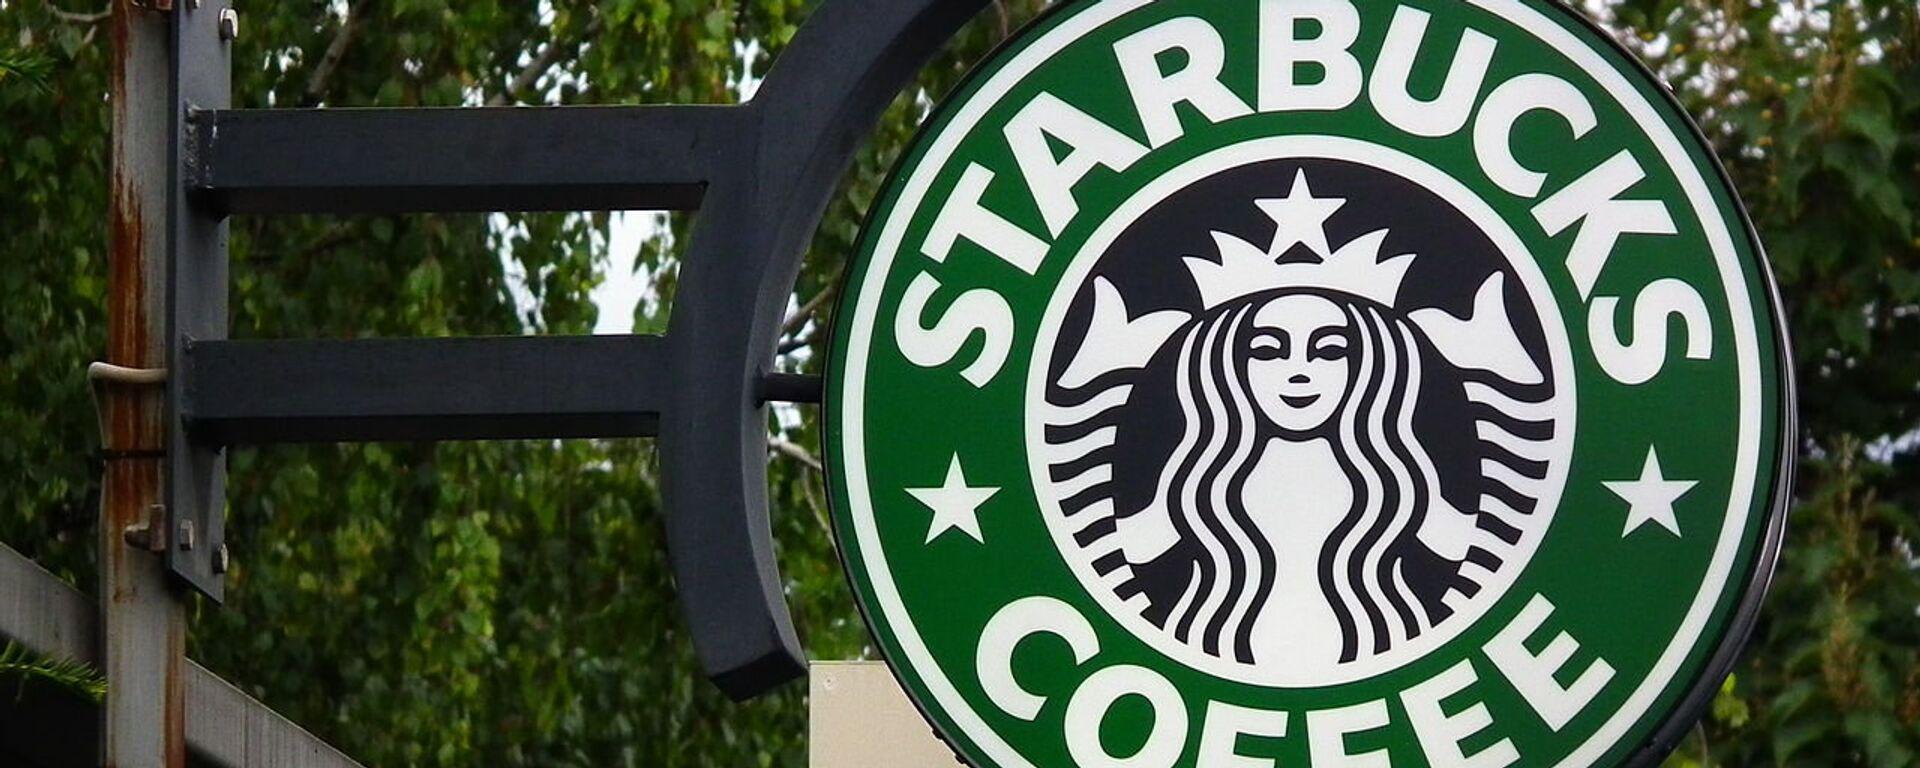 Starbucks Coffee - Sputnik Italia, 1920, 08.09.2020